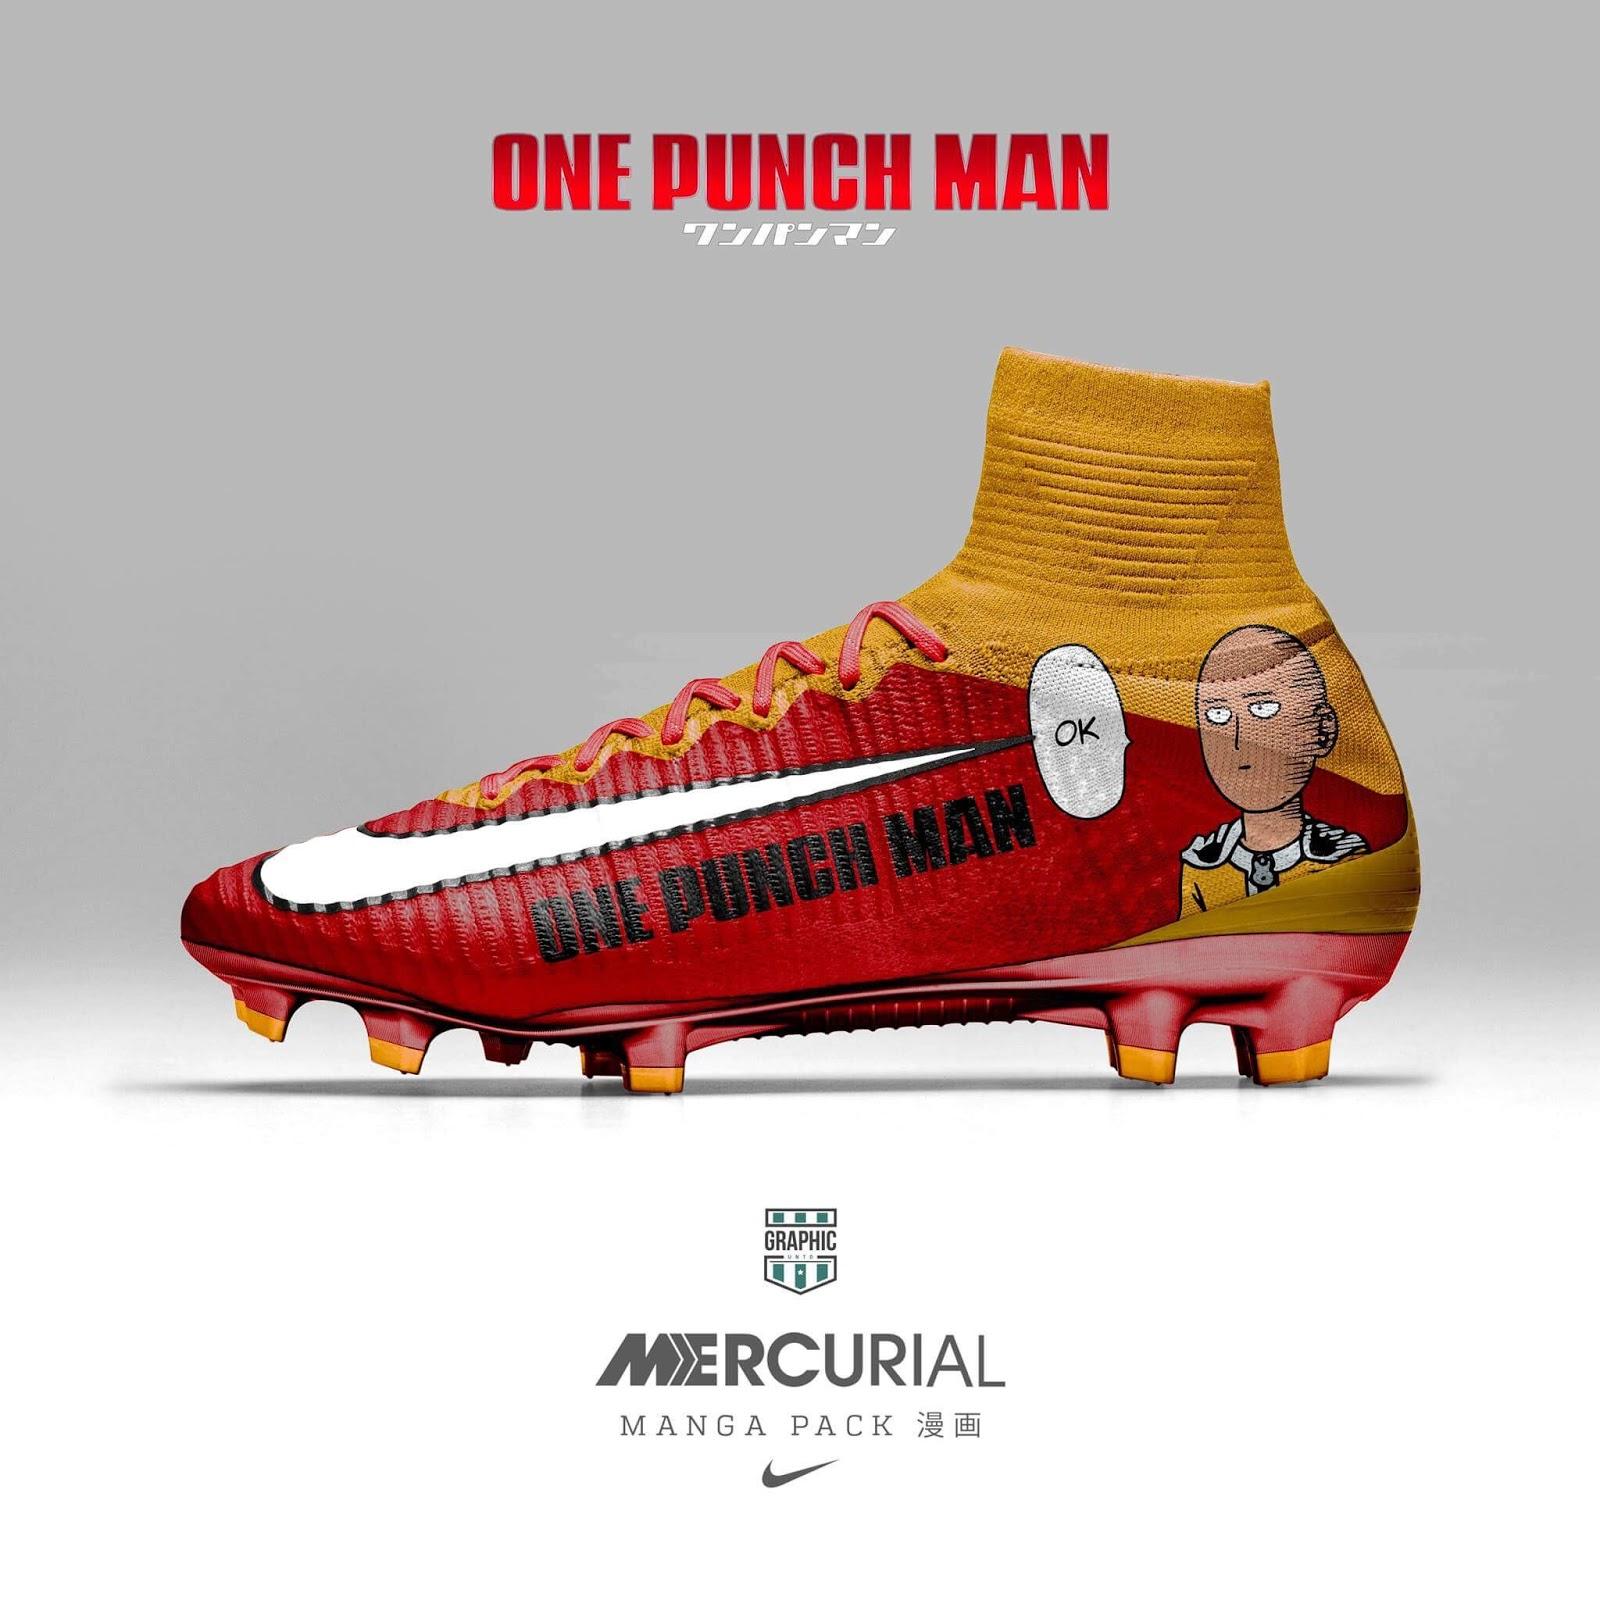 f7e446e4c44 Nike Mercurial Manga Pack - One Punch Man ...